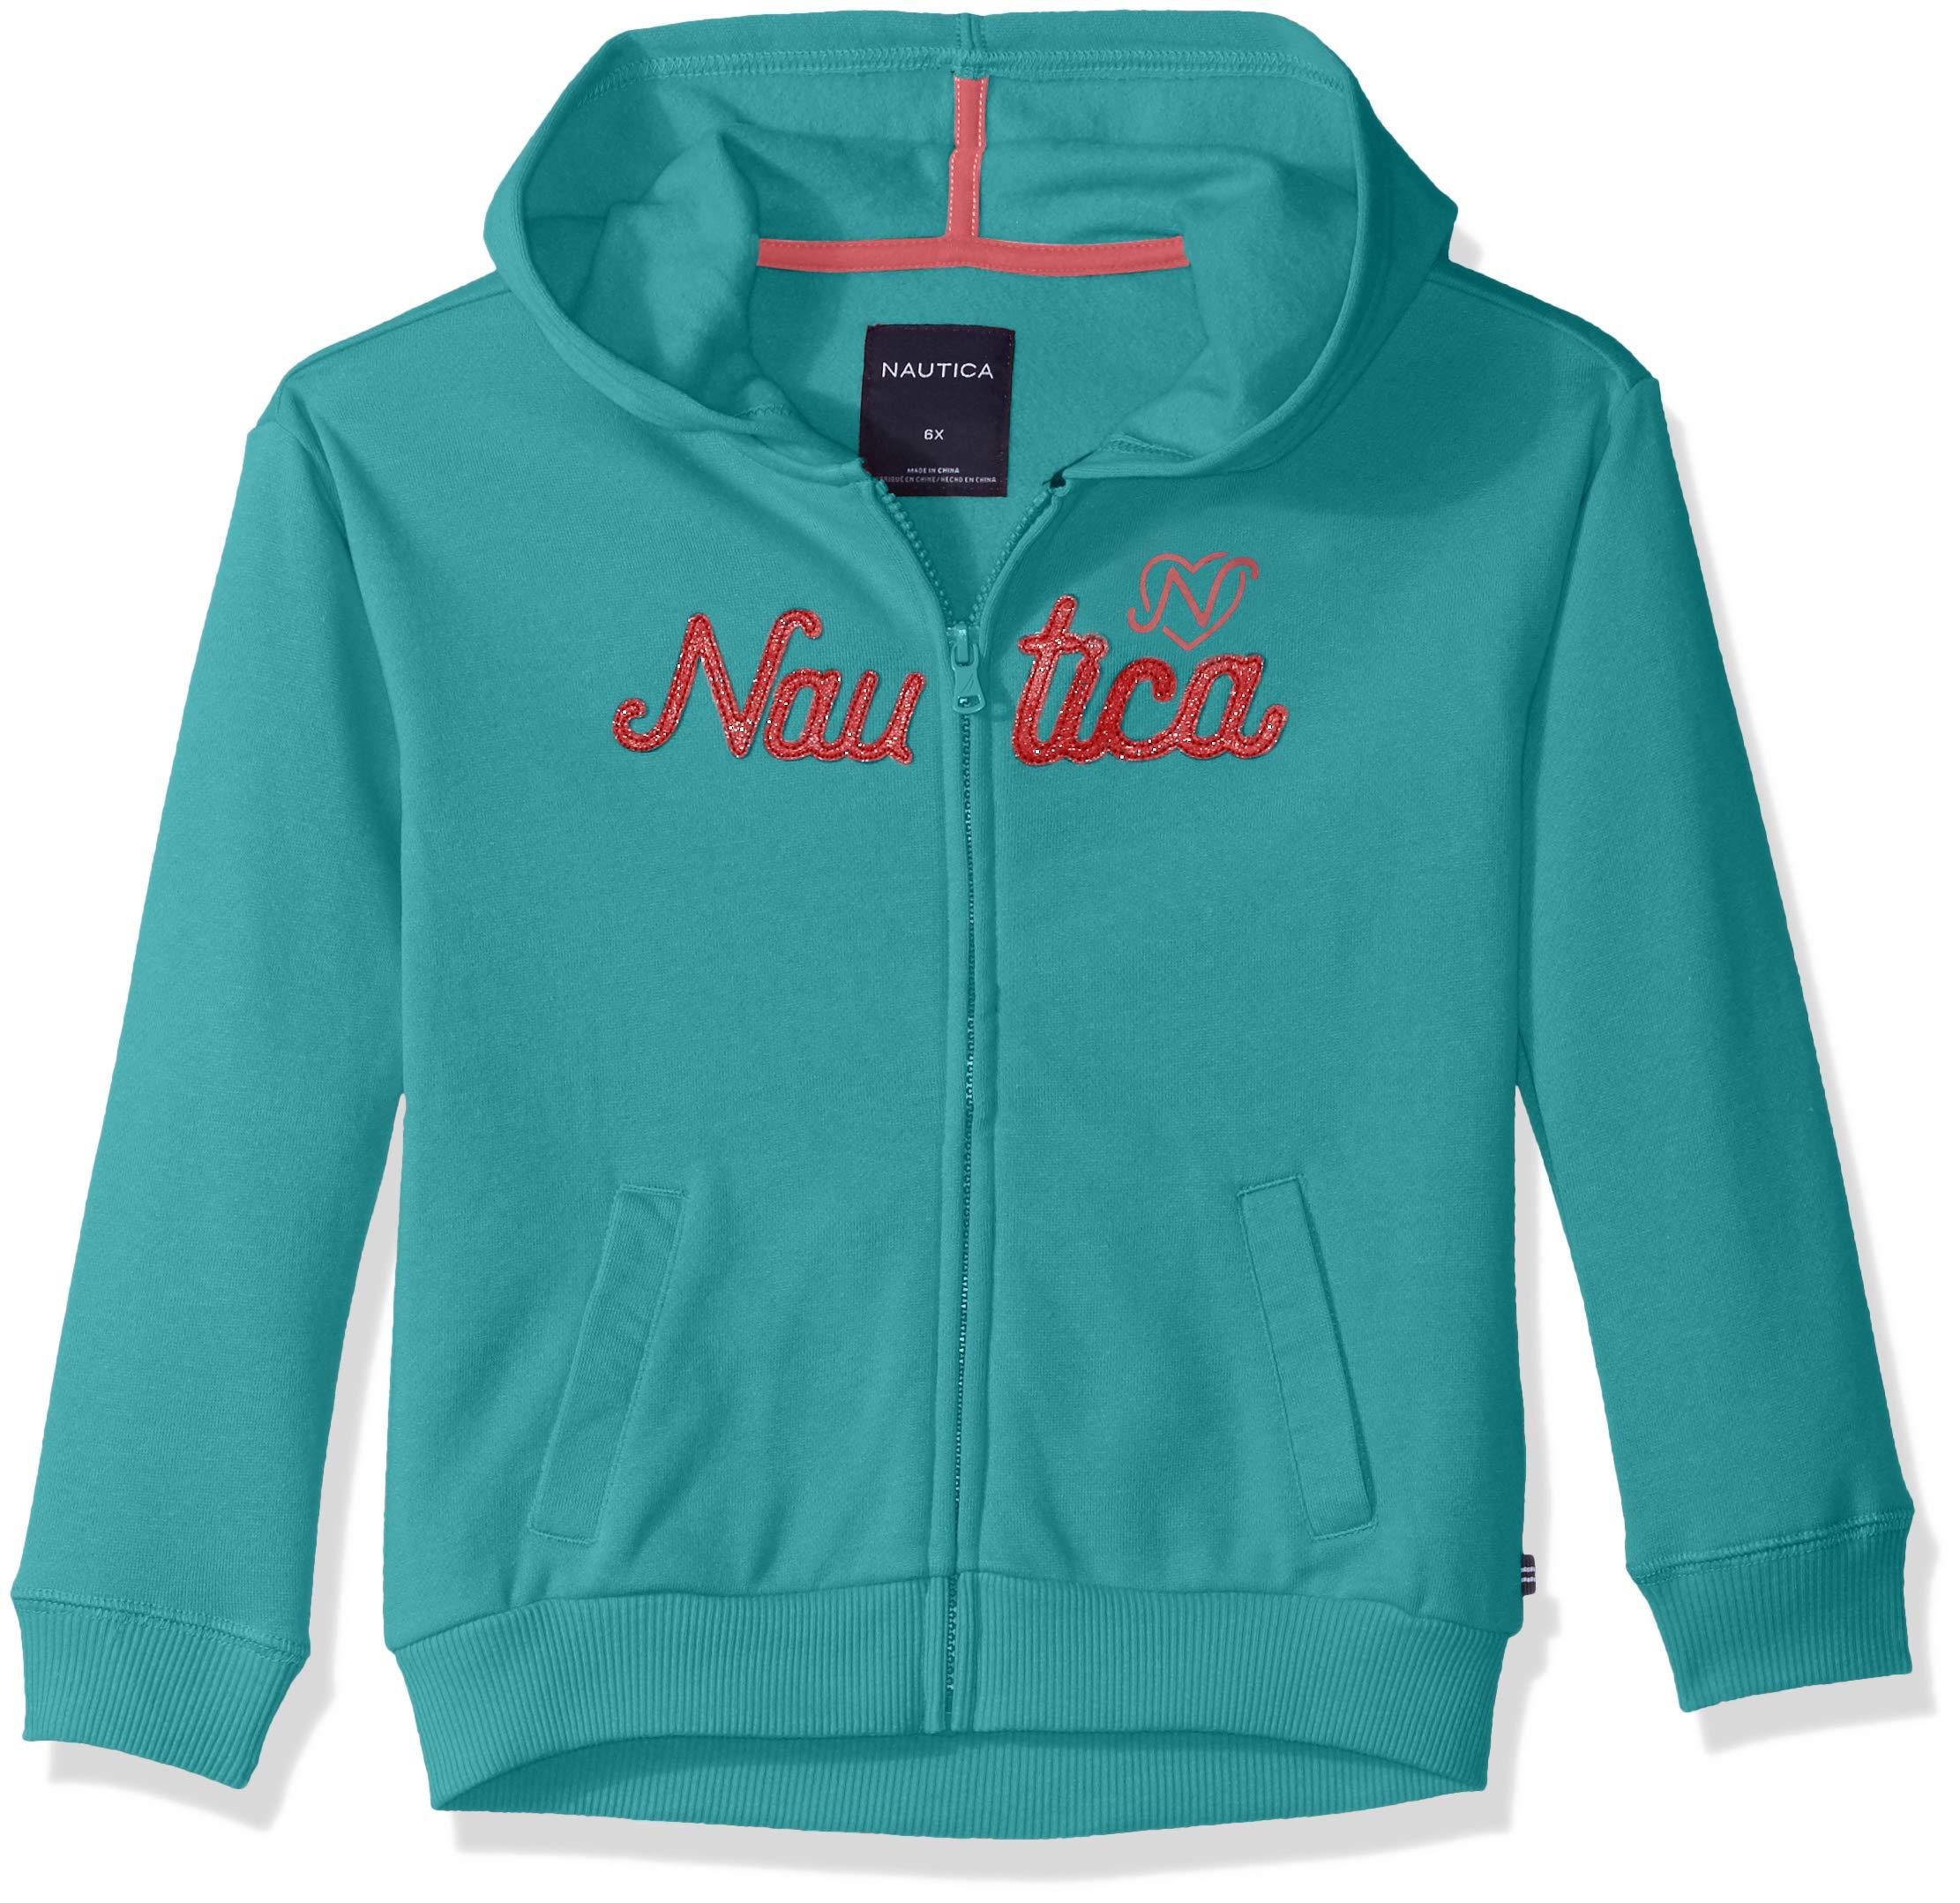 Nautica Little Girls' Long Sleeve Hoody, Dark Aqua Logos, 5